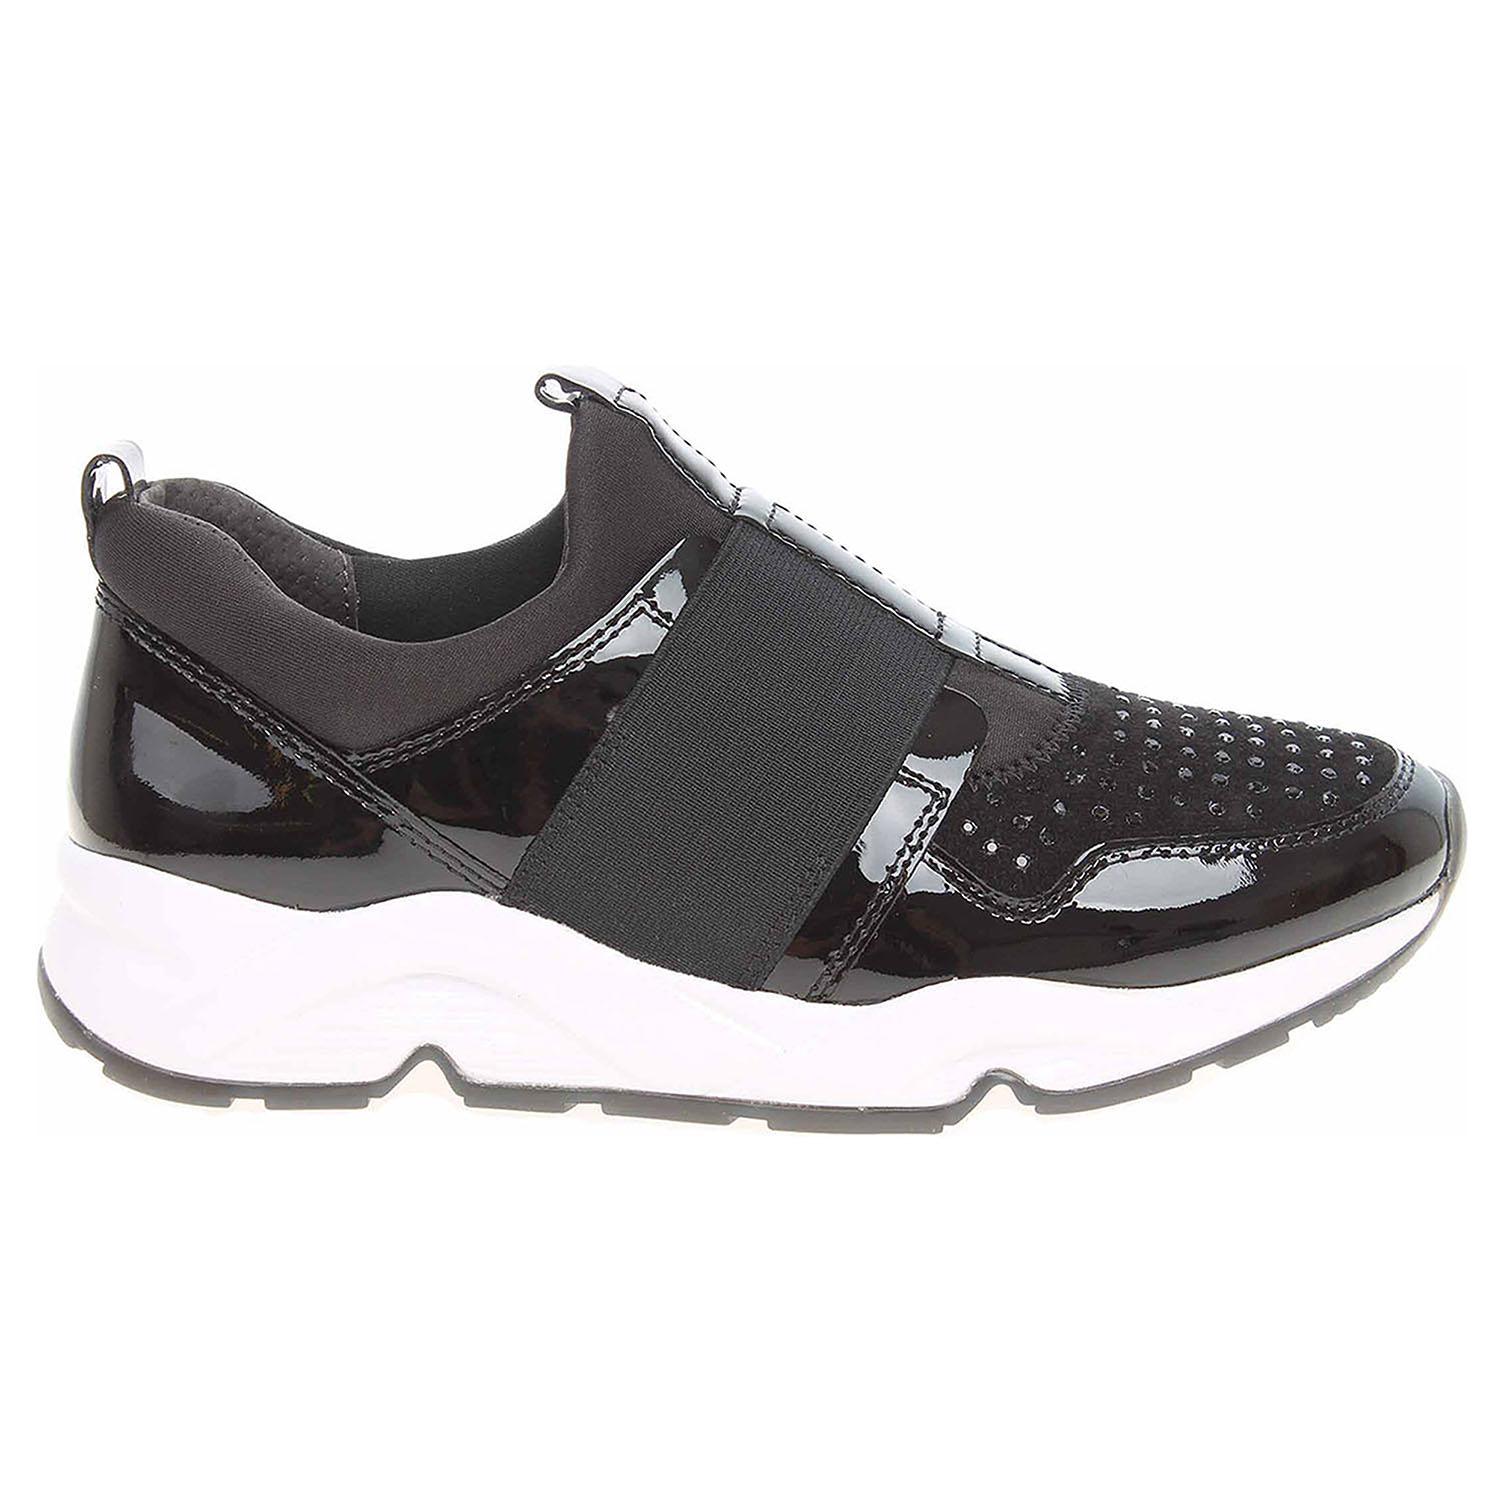 Gabor dámská obuv 76.321.97 černá 76.321.97 38